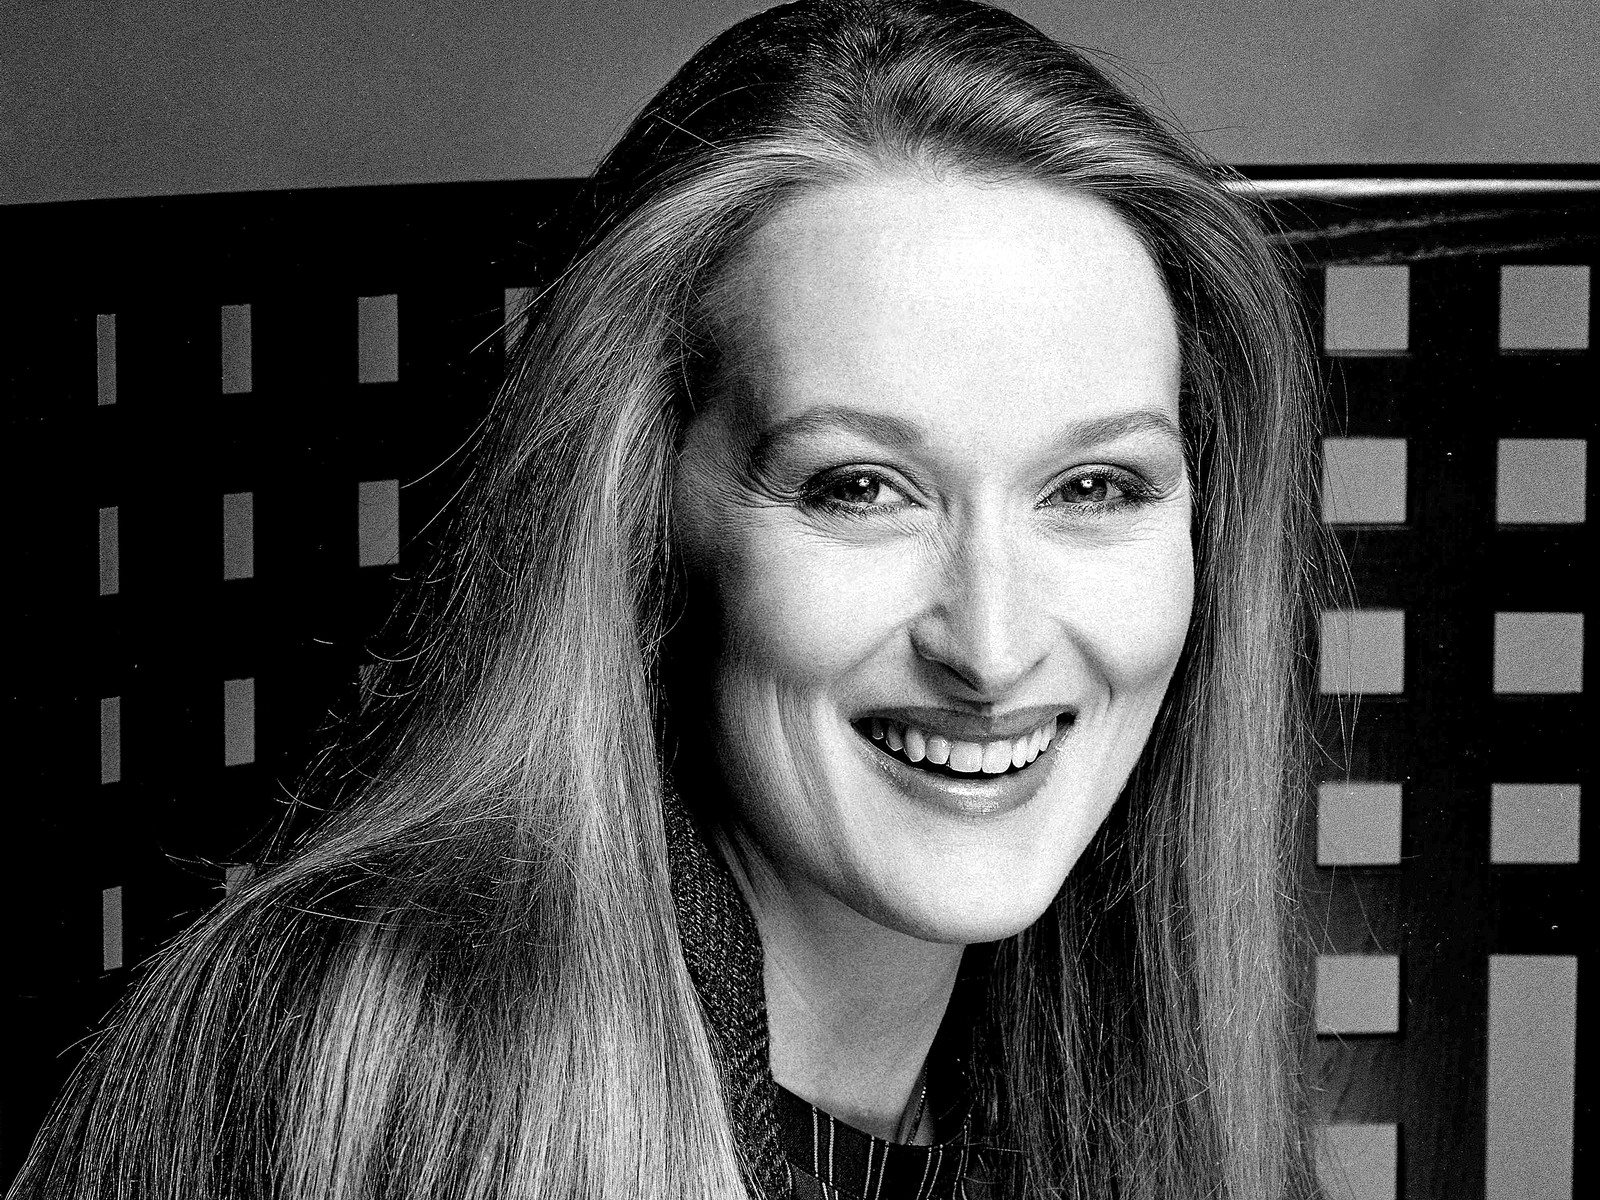 Meryl-Streep-Wallpaper_-1